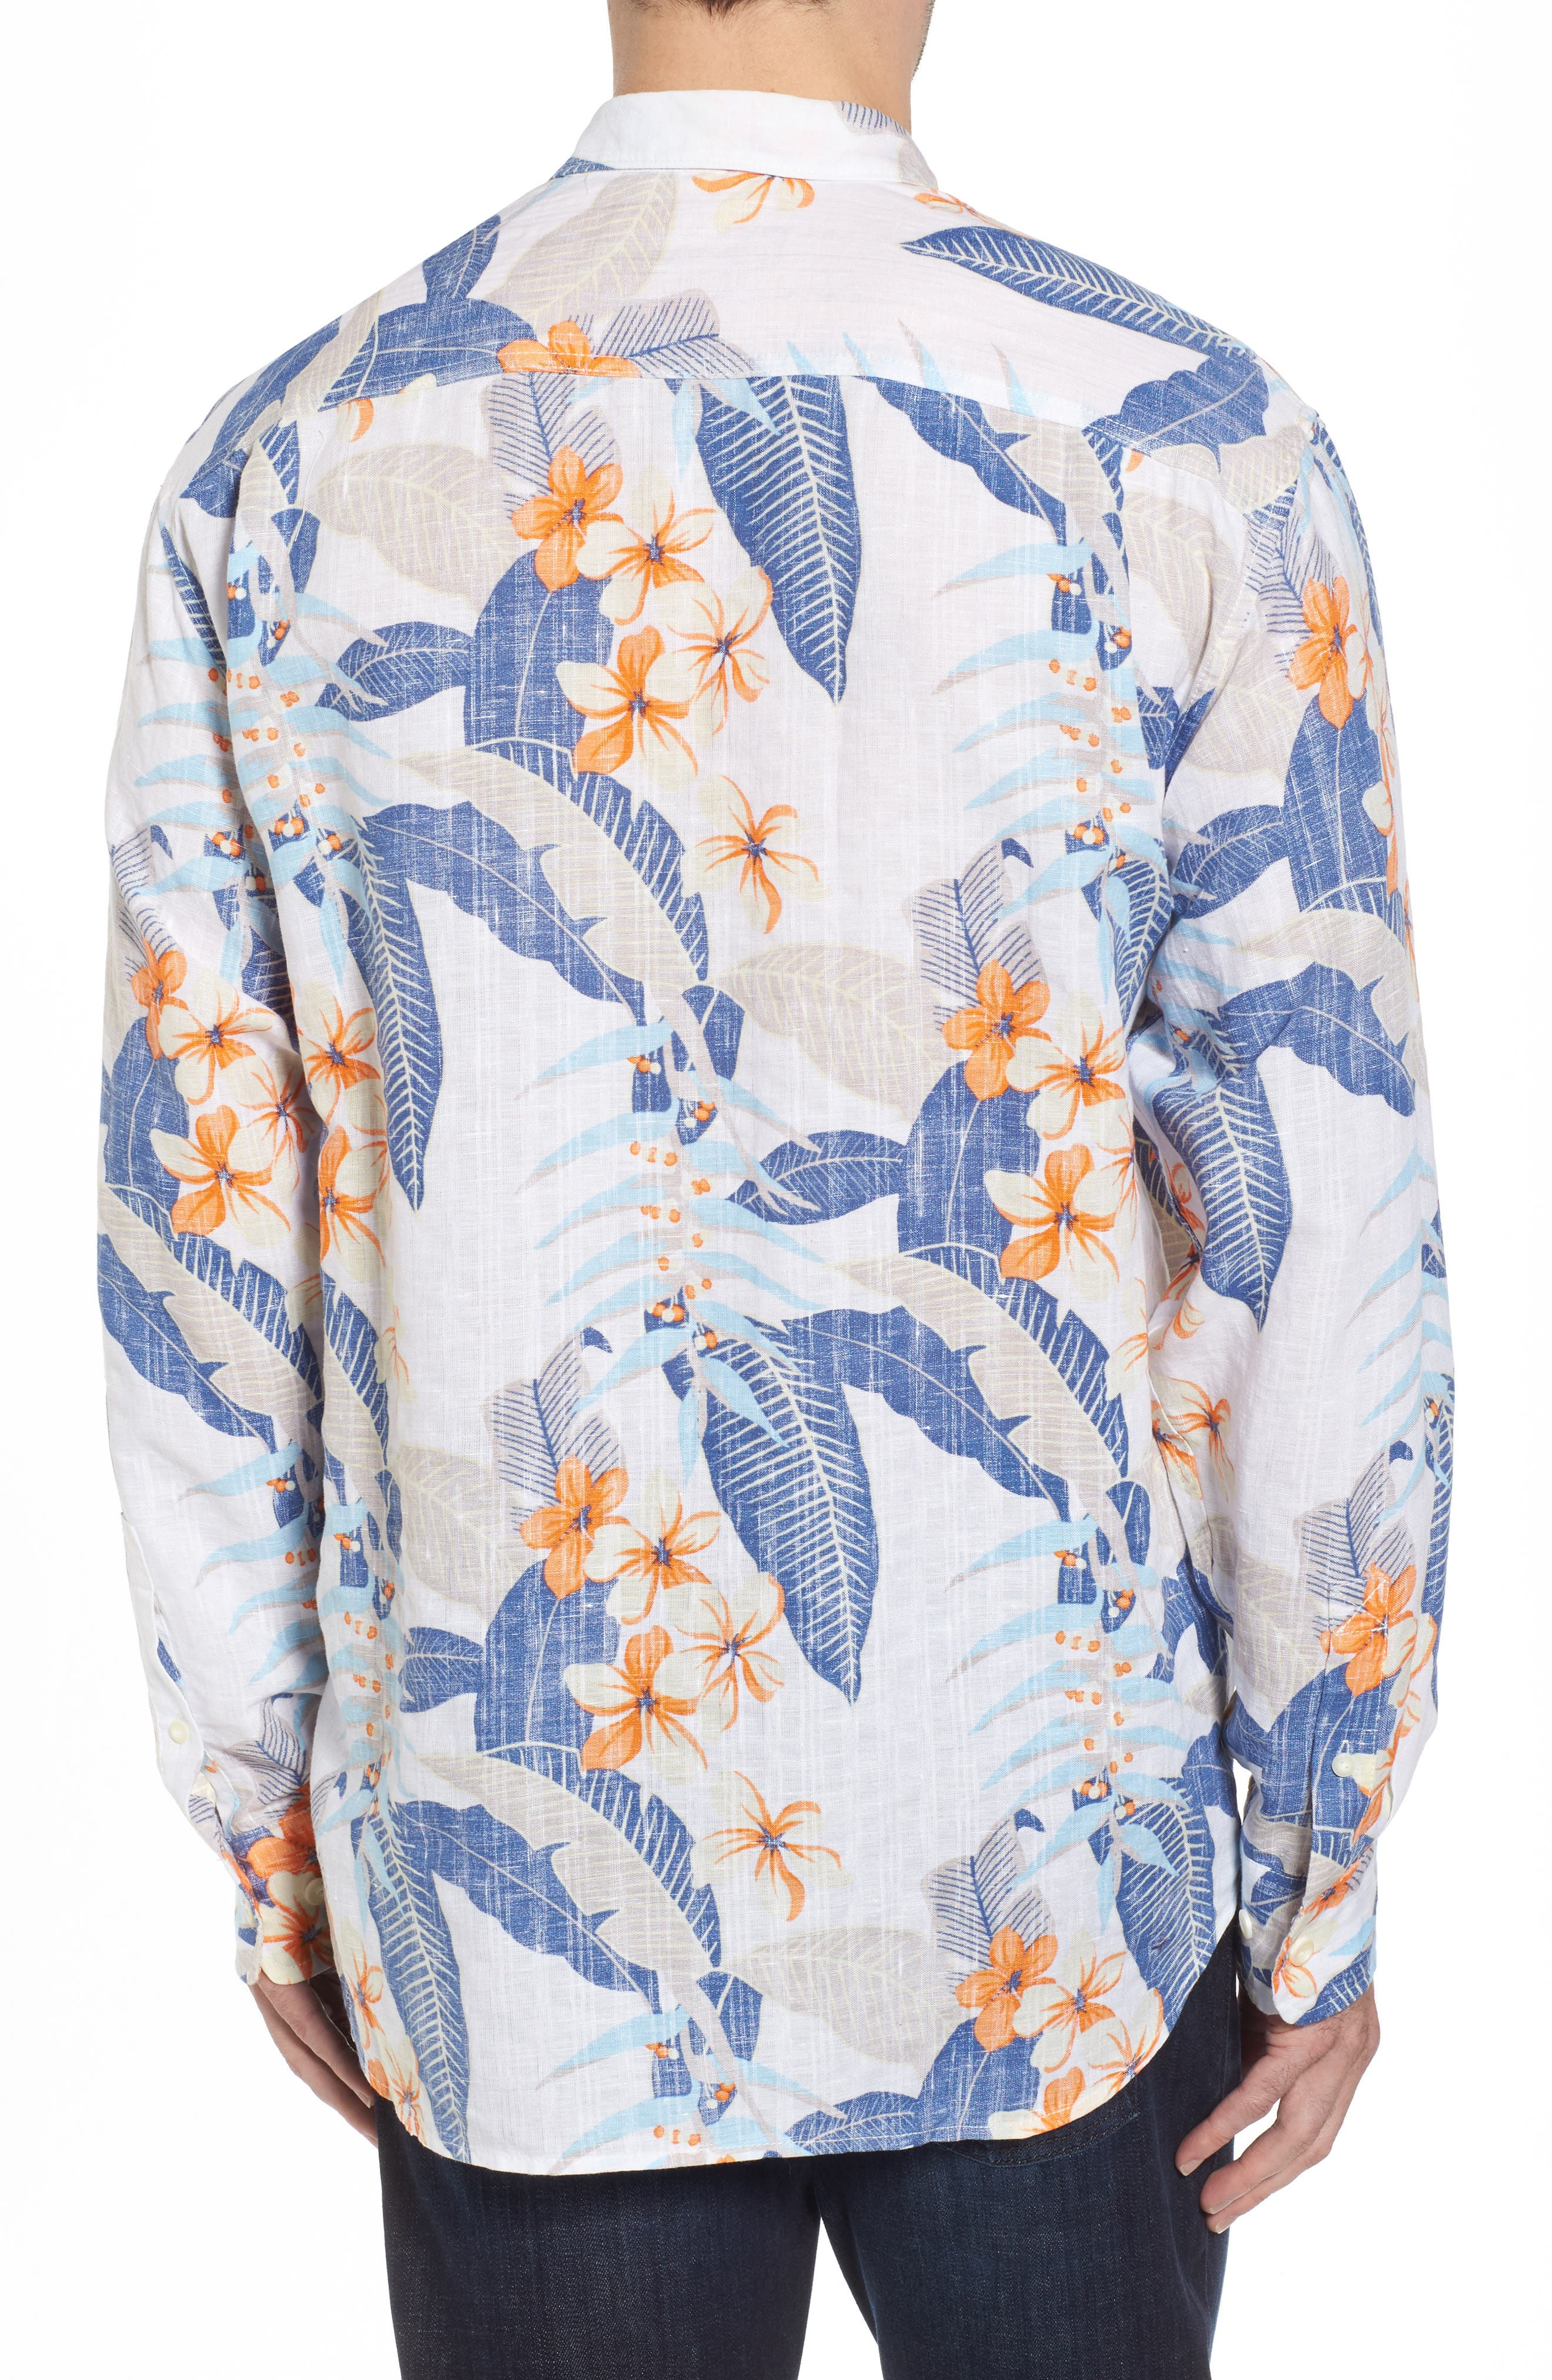 Liviea Leaves Linen Blend Camp Shirt,                             Alternate thumbnail 2, color,                             100